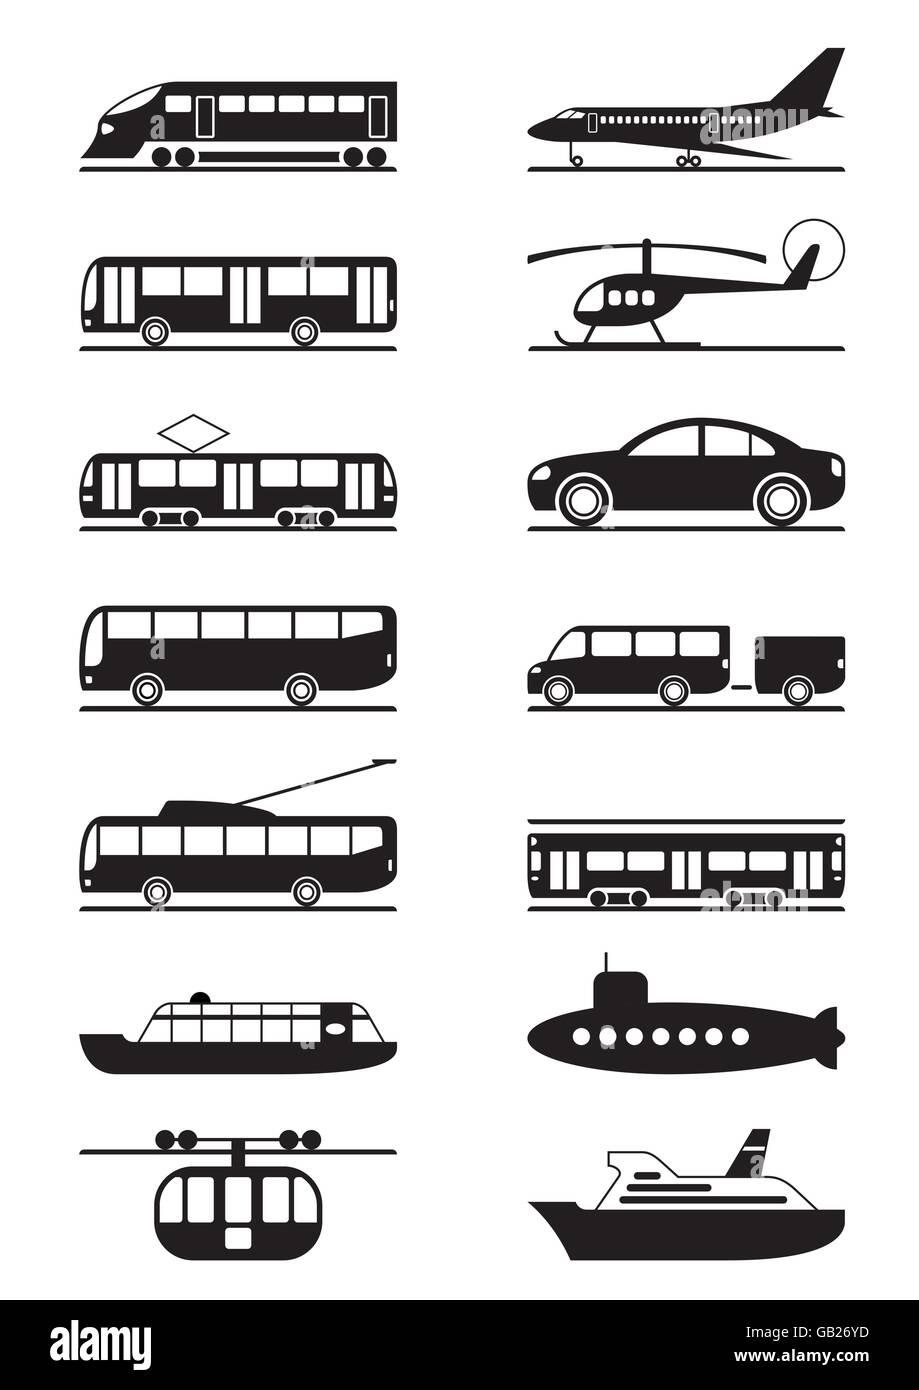 Passenger and public transportation - vector illustration - Stock Image